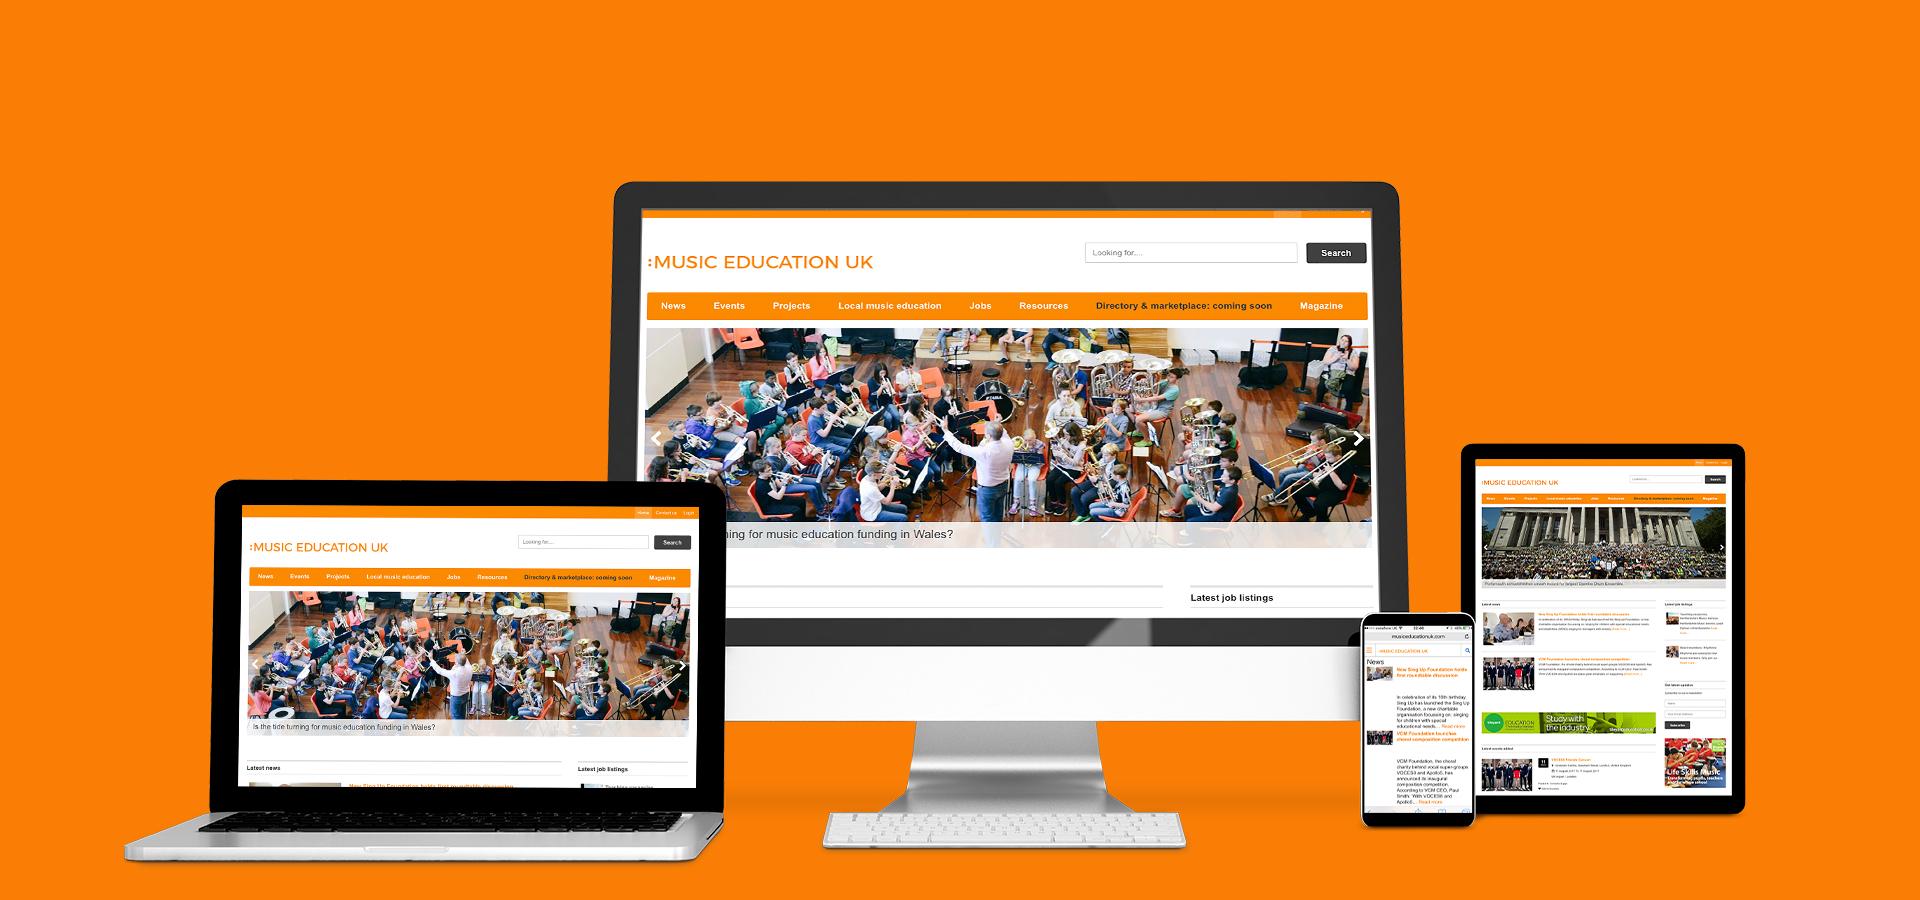 View Music Education UK on desktop, laptop, tablet or phone